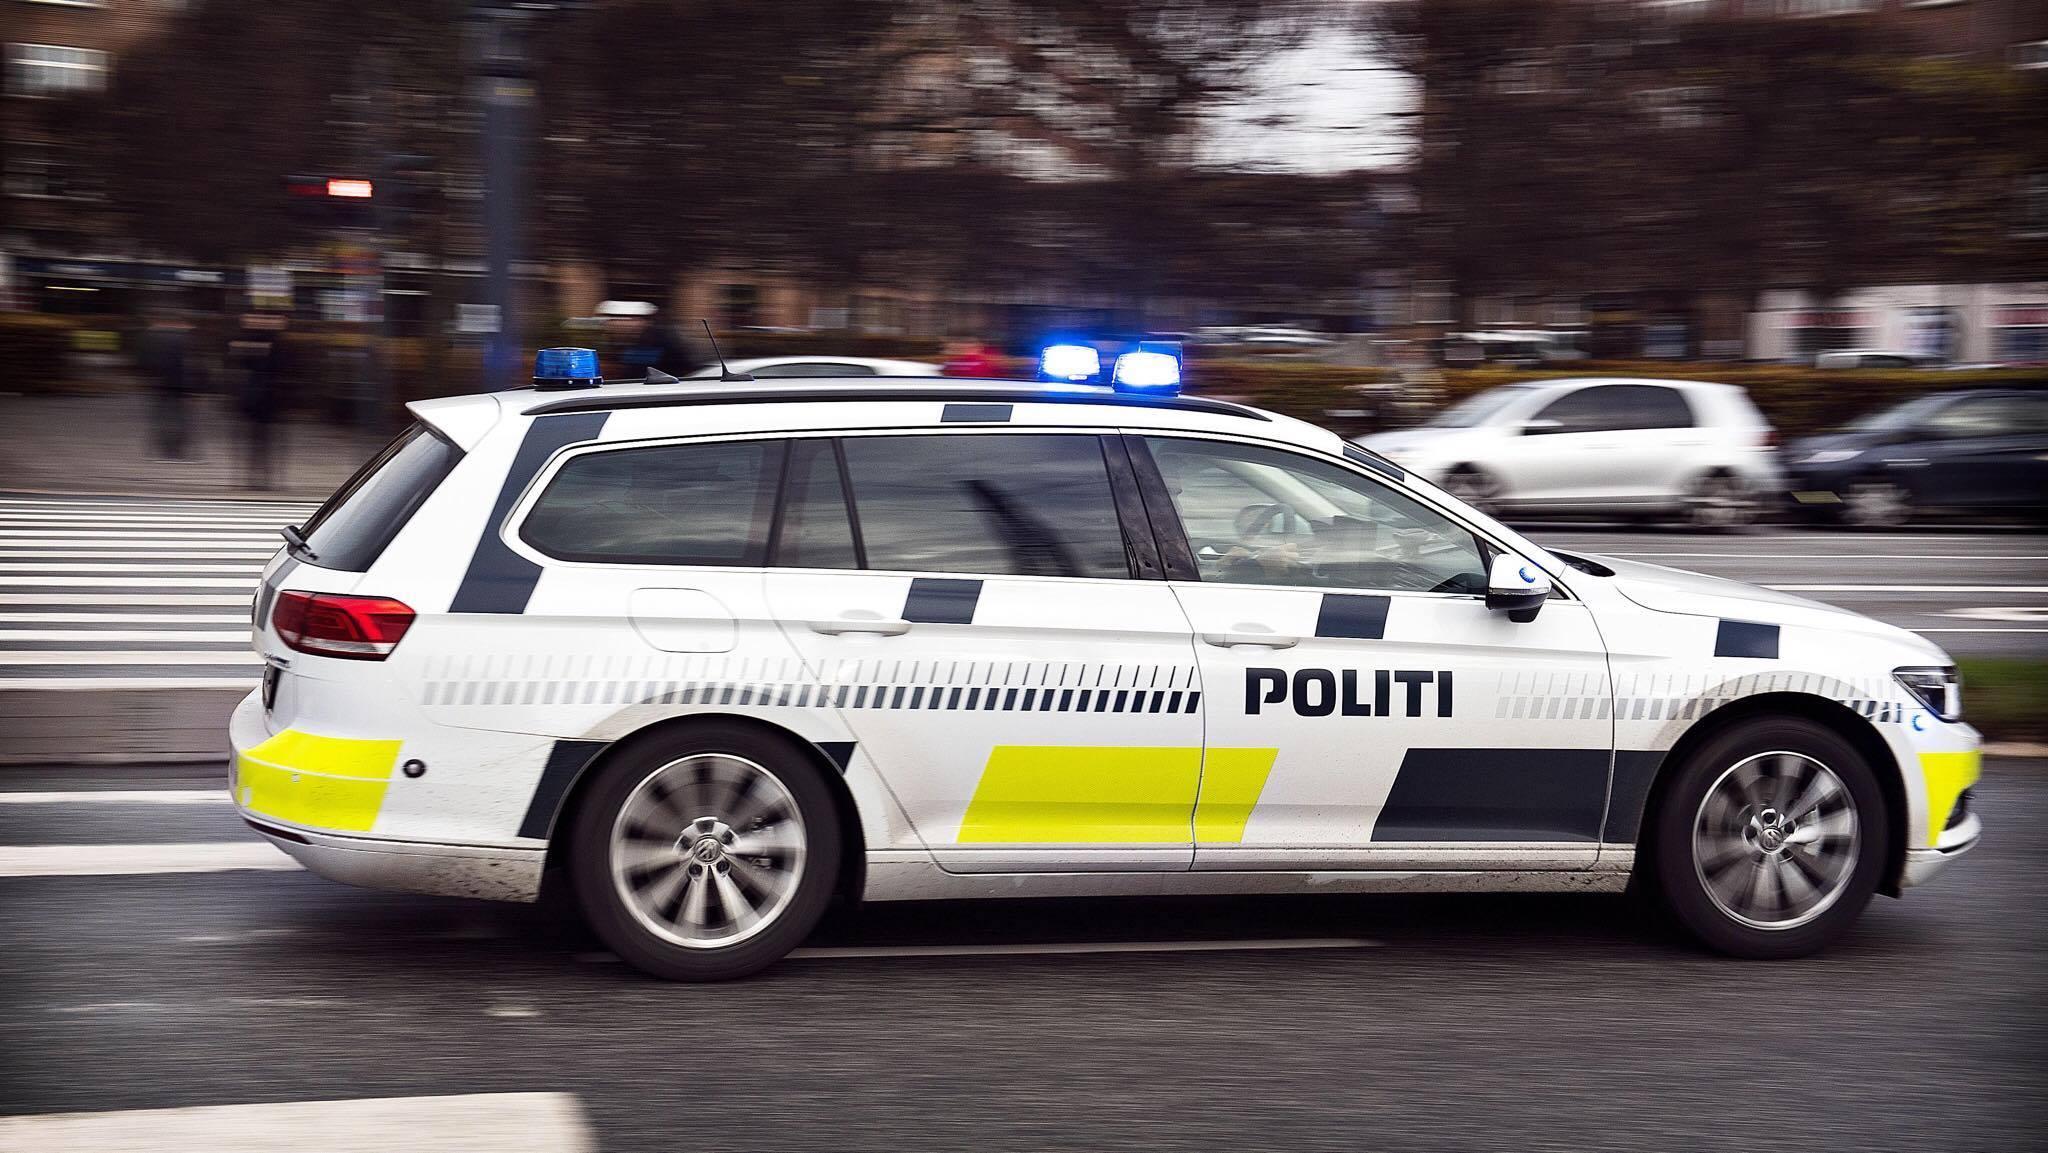 Politiet